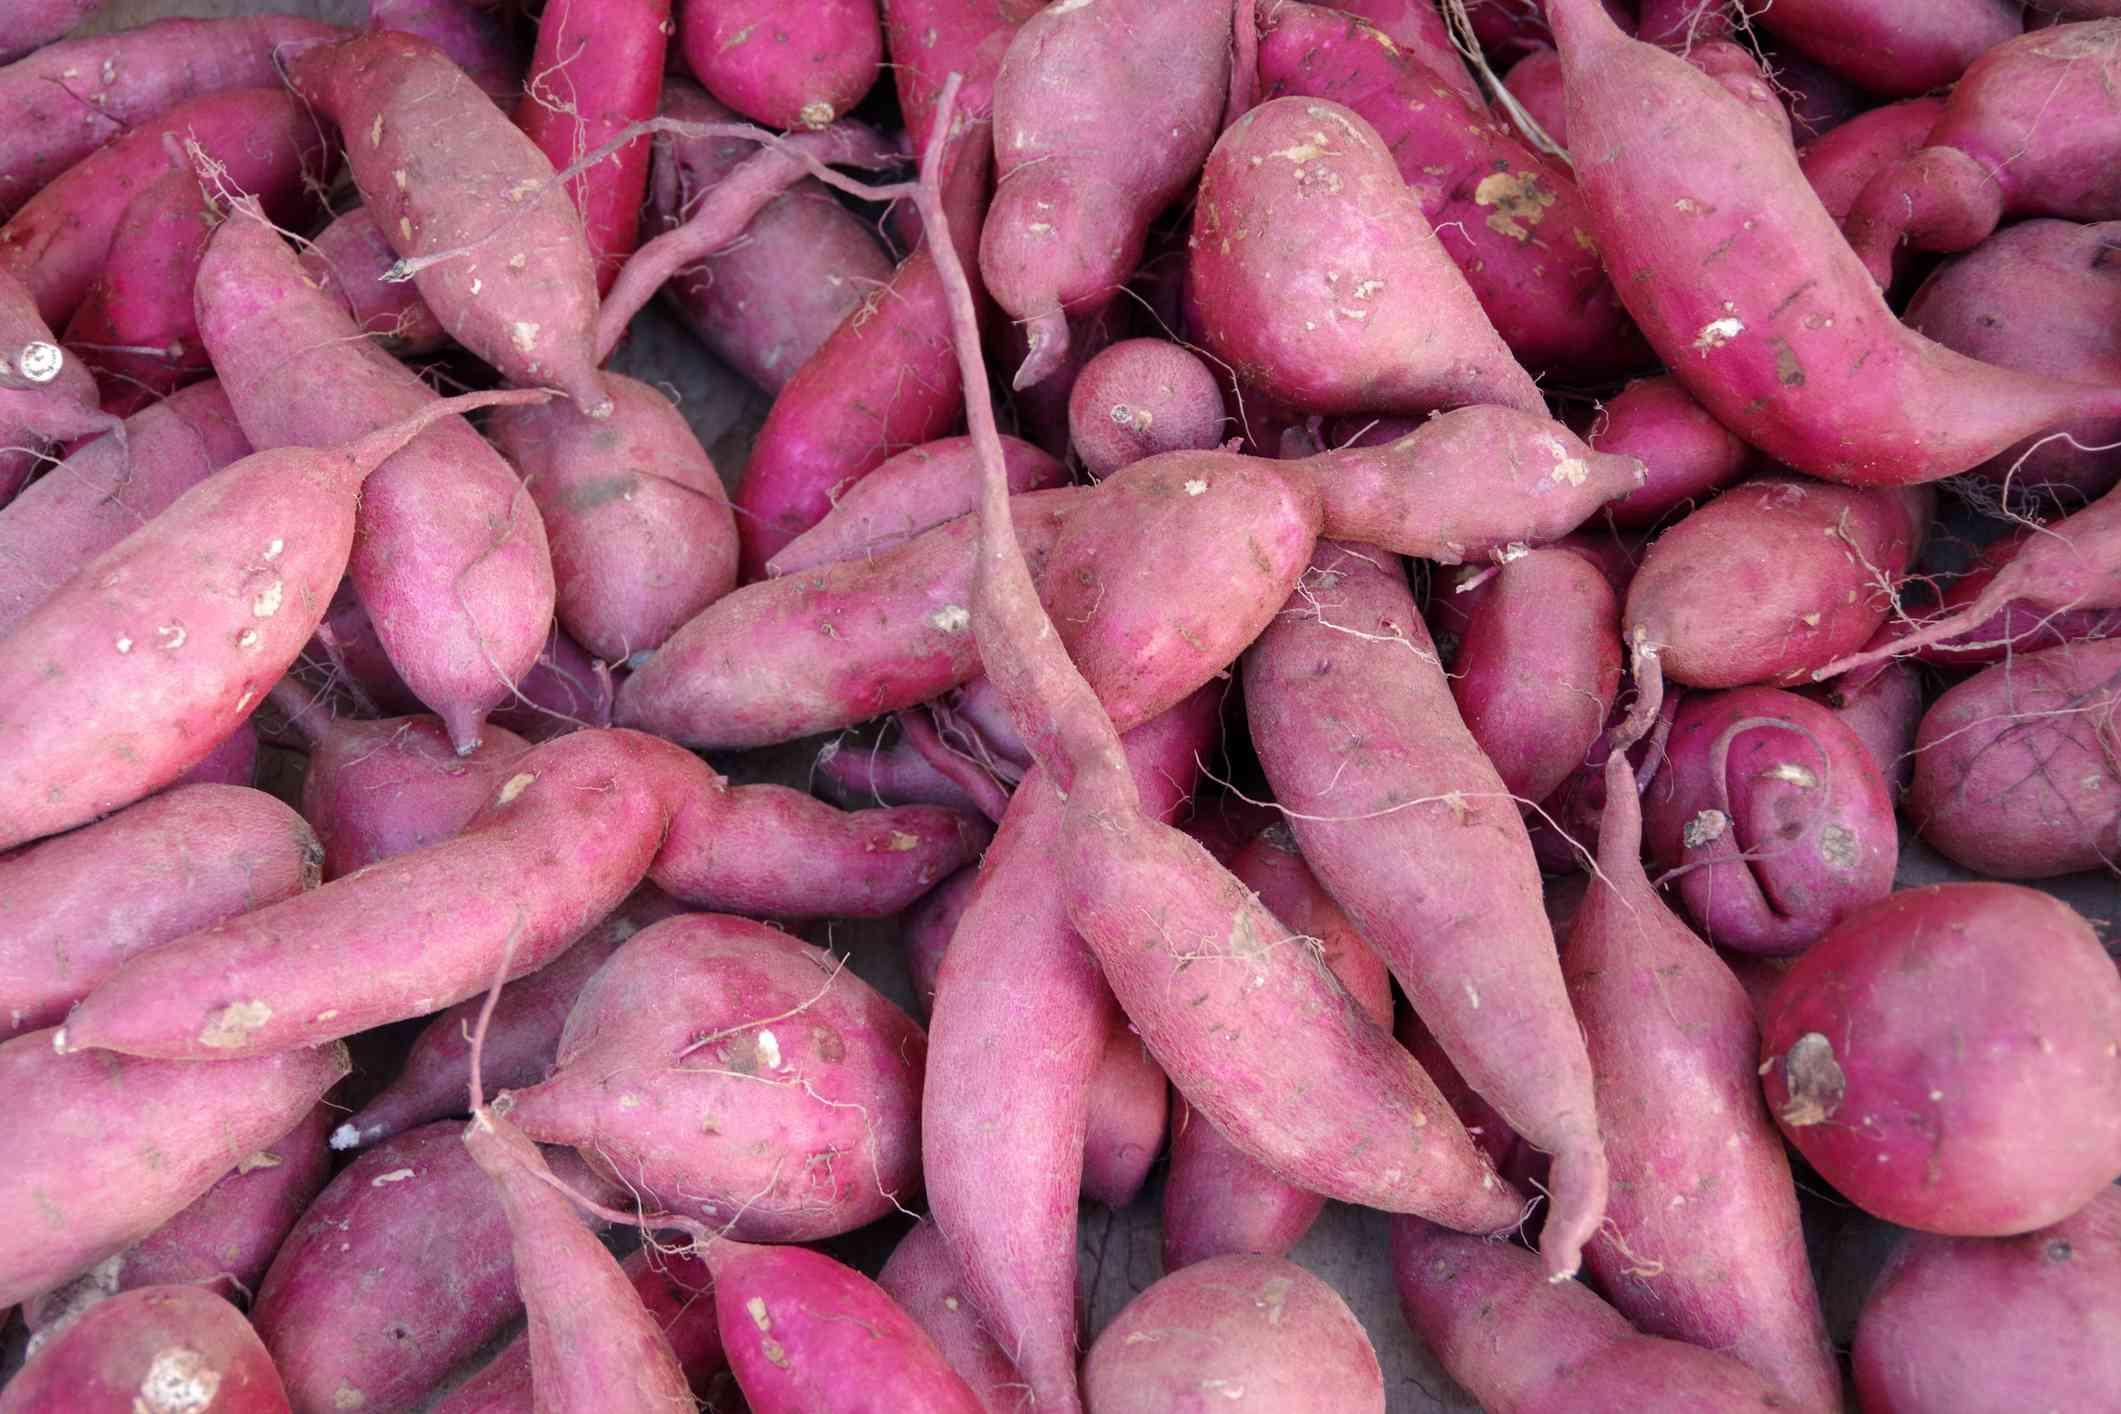 pile of purple-pink Japanese sweet potatoes